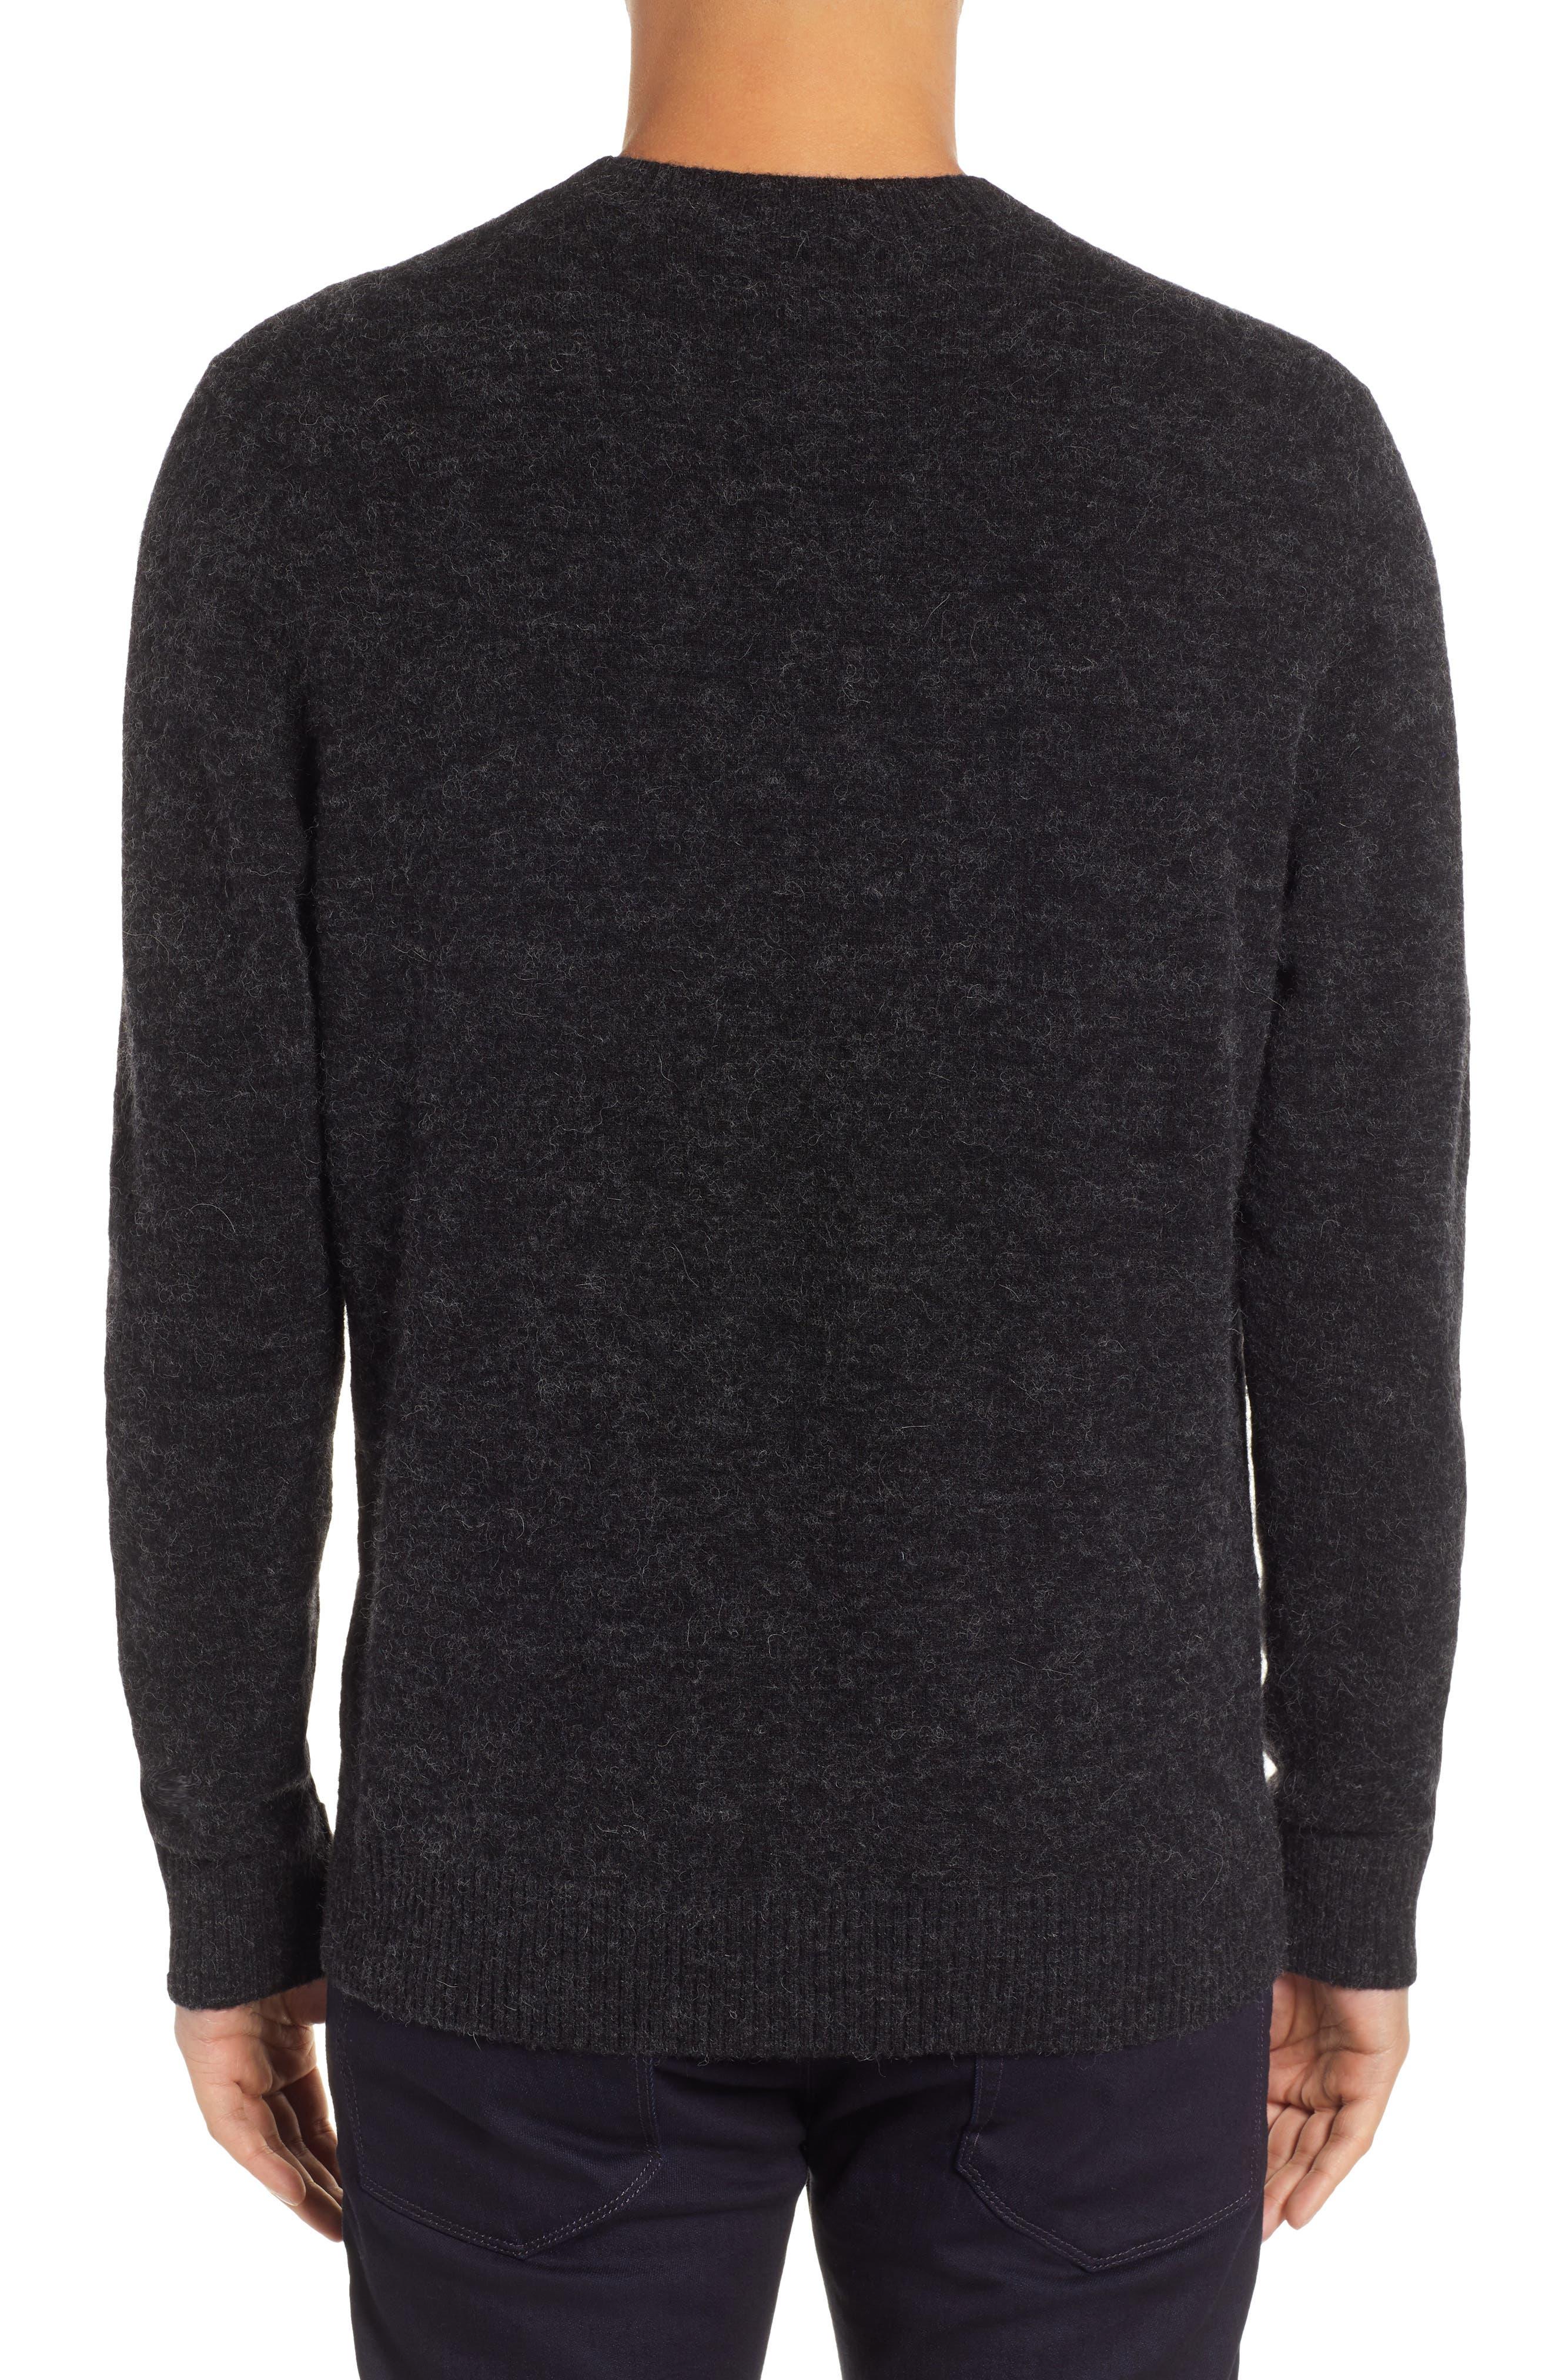 Seridon Oversize Crewneck Sweater,                             Alternate thumbnail 2, color,                             020